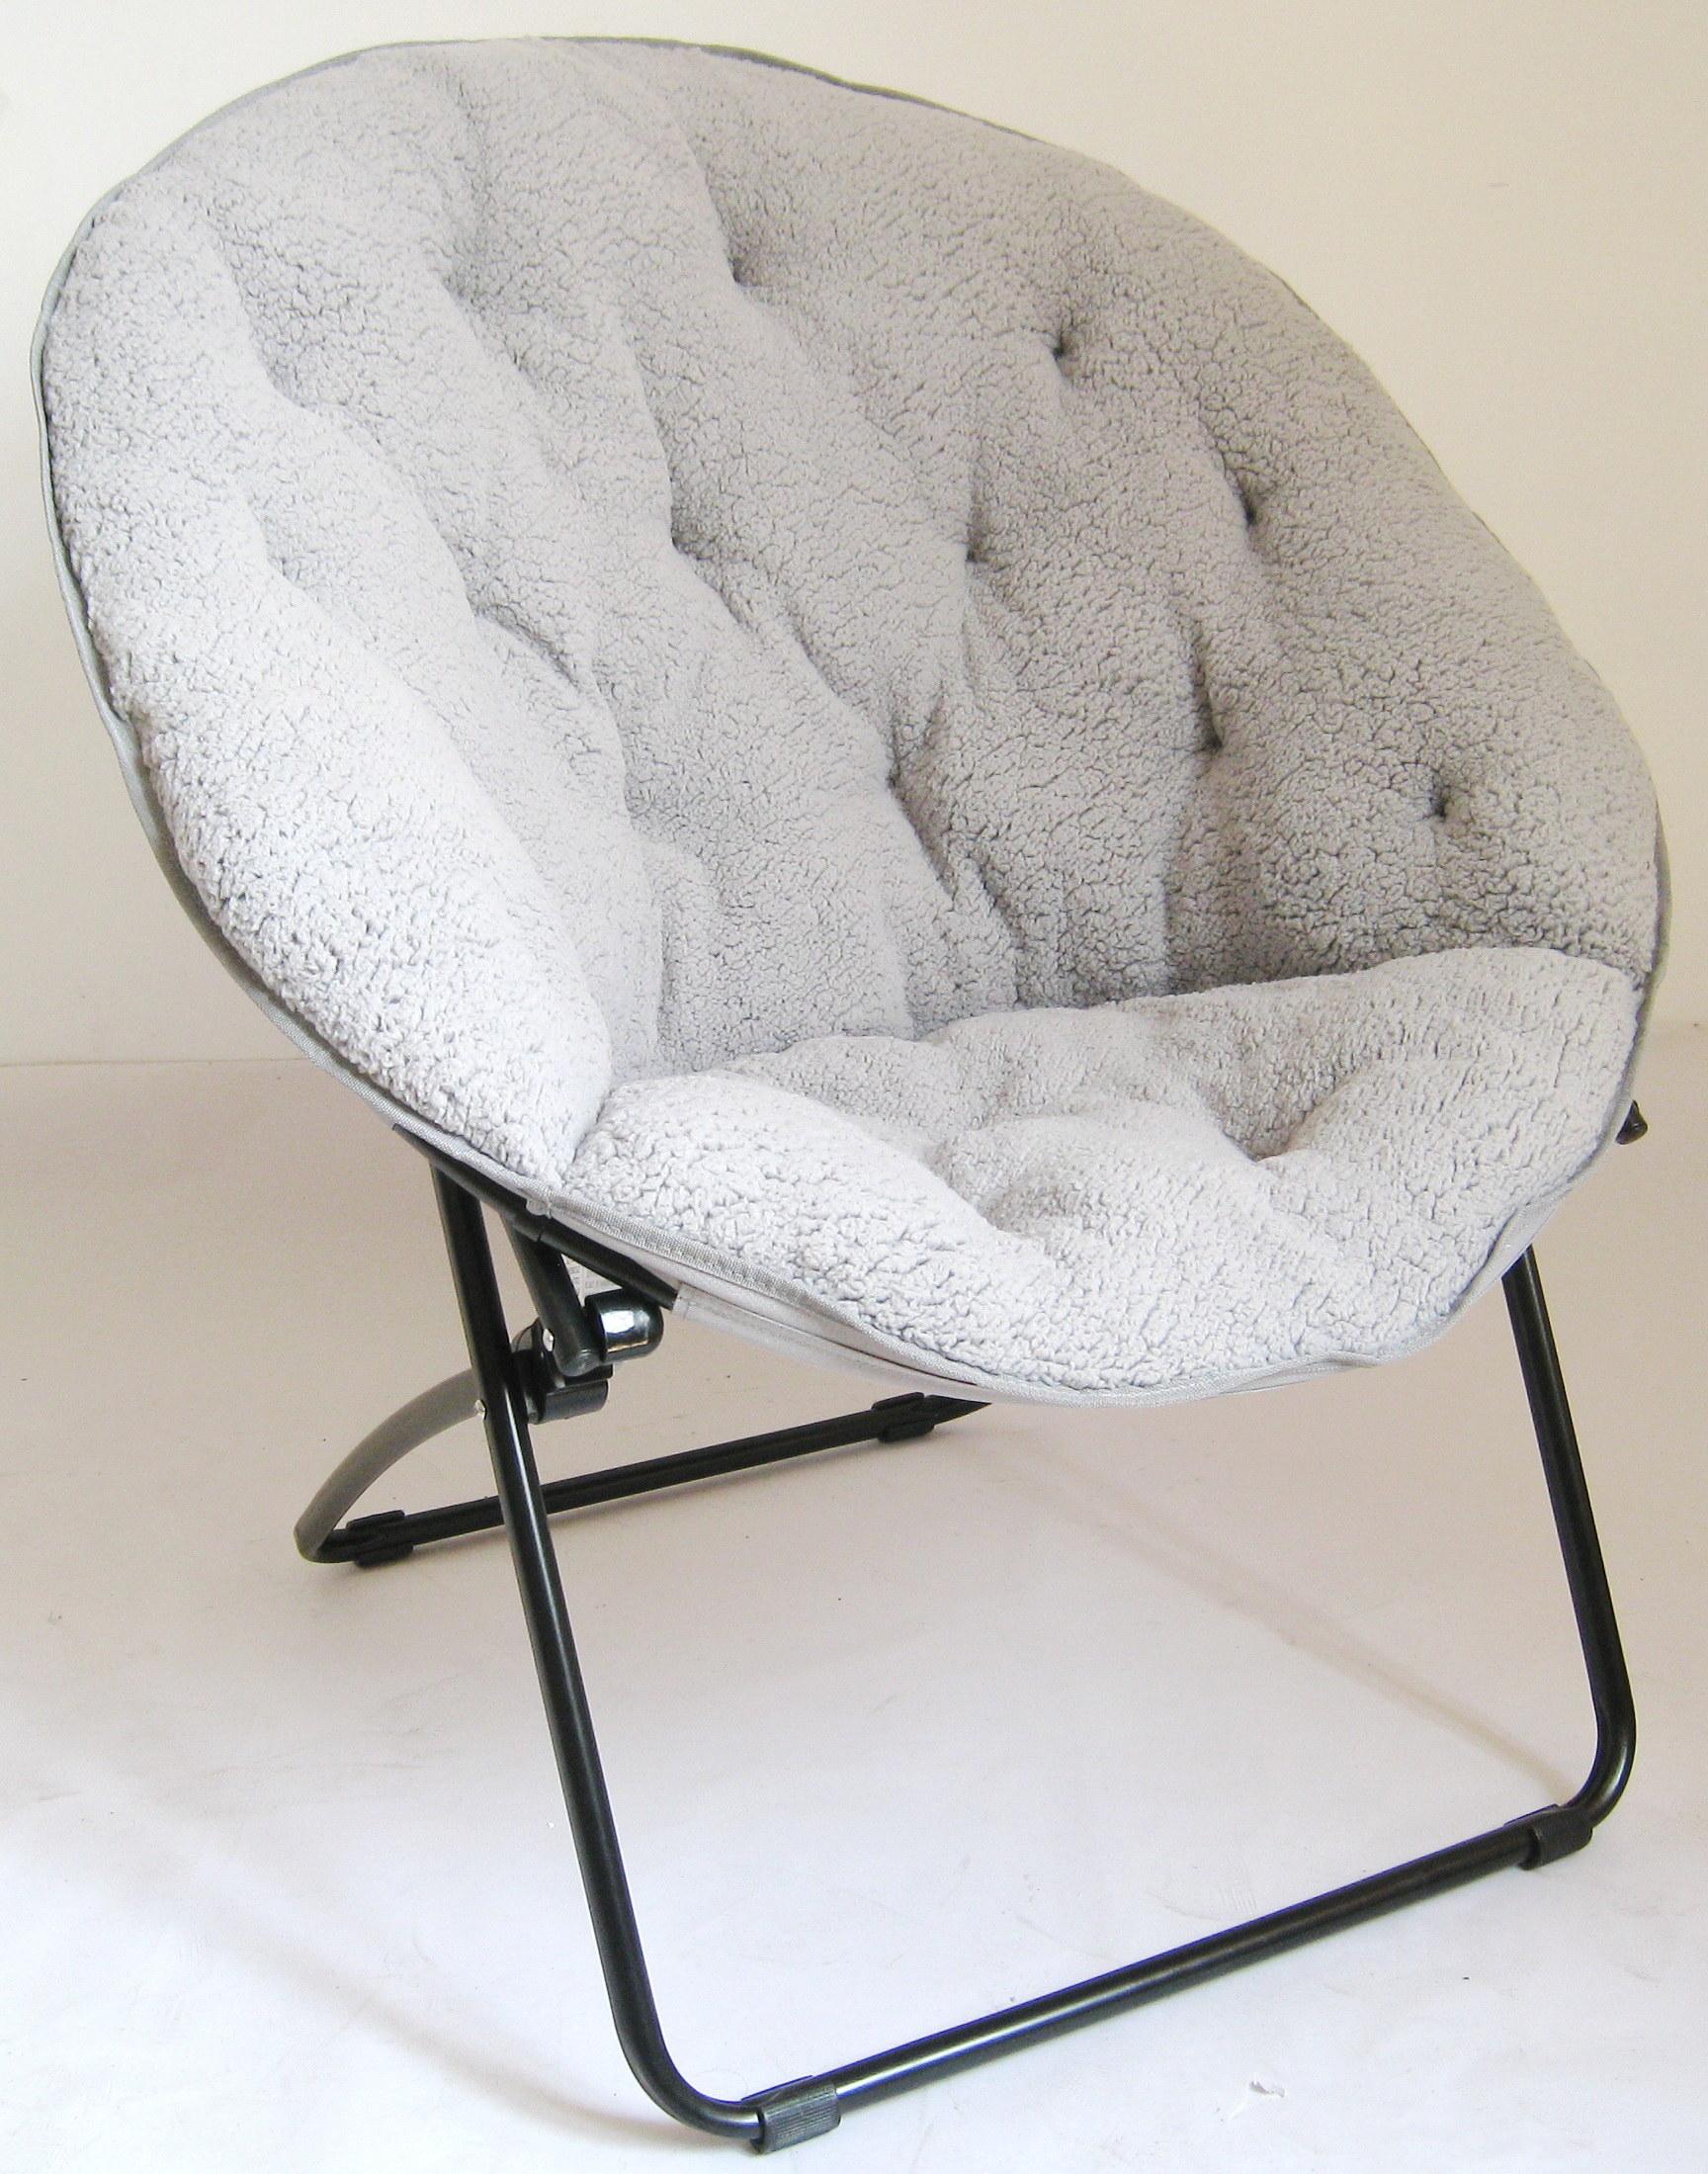 The grey circular chair